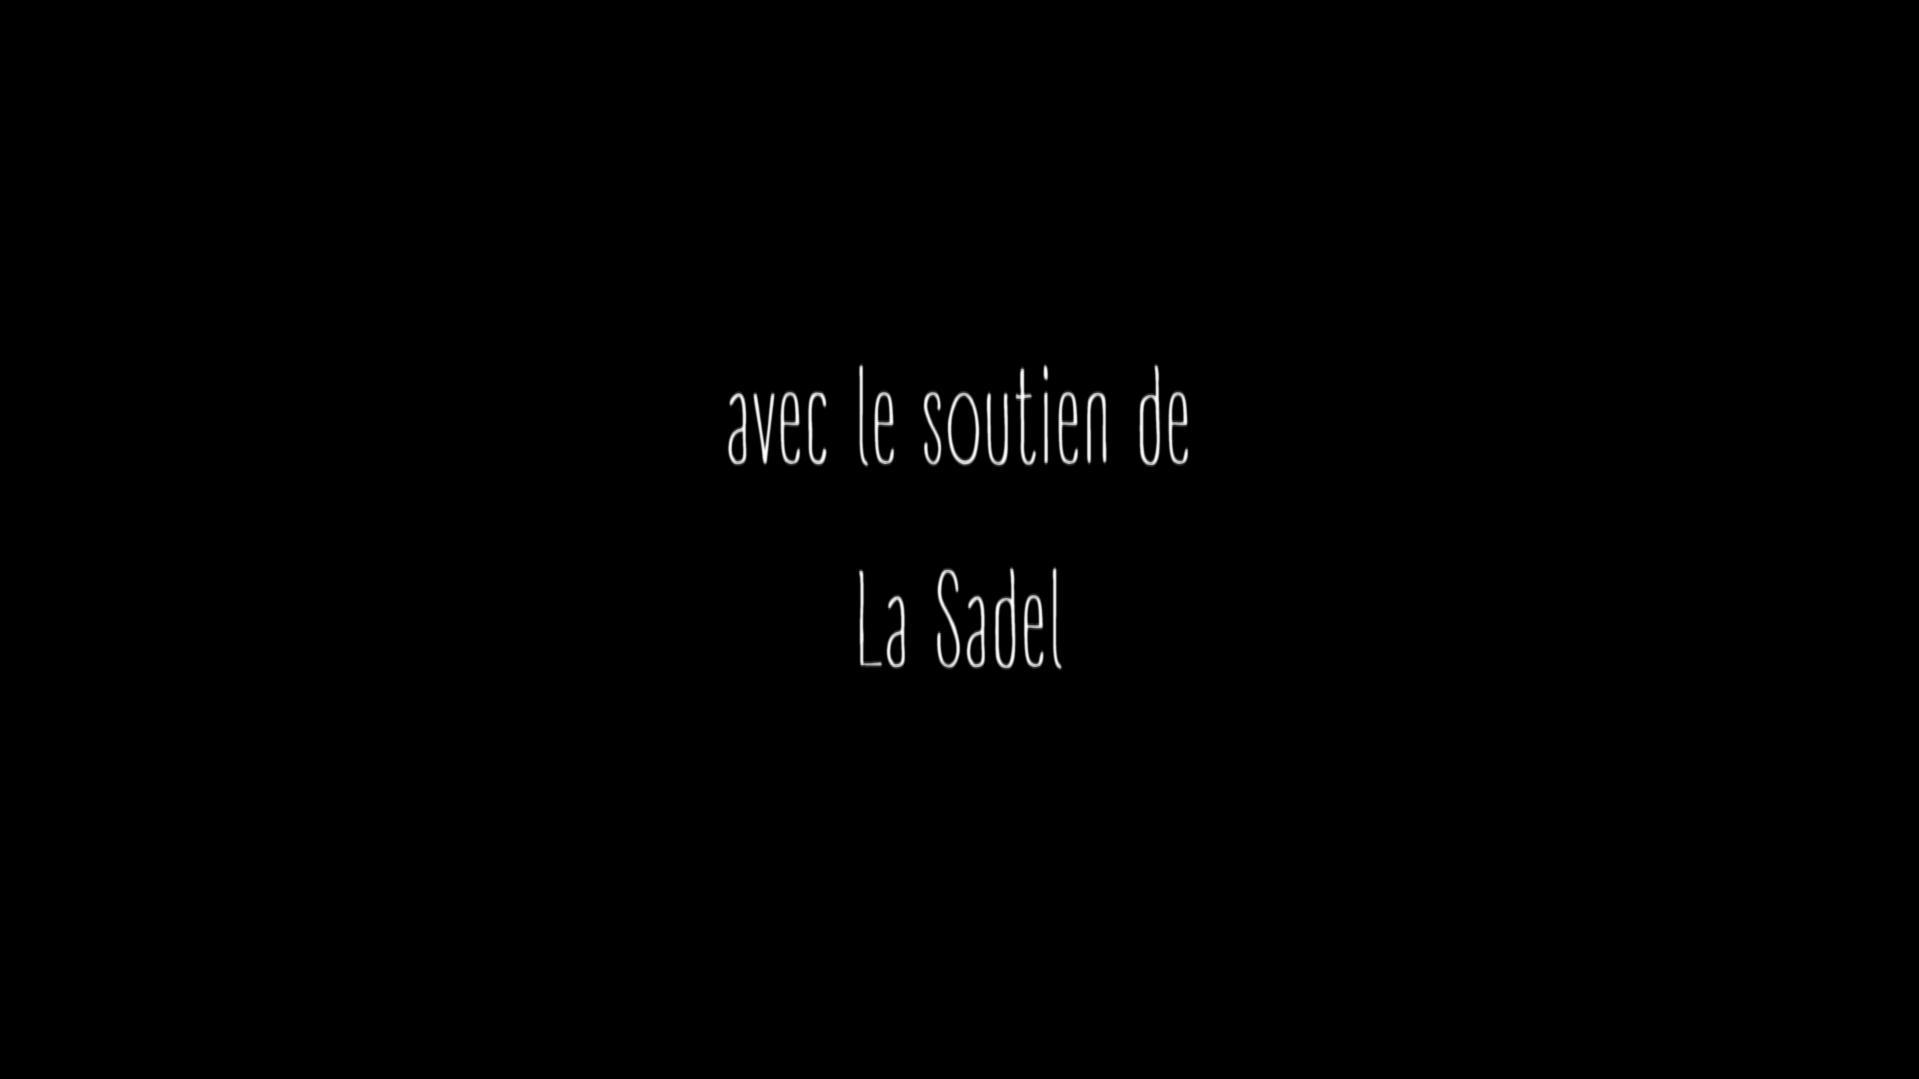 La_Sadel-1518865562.jpg